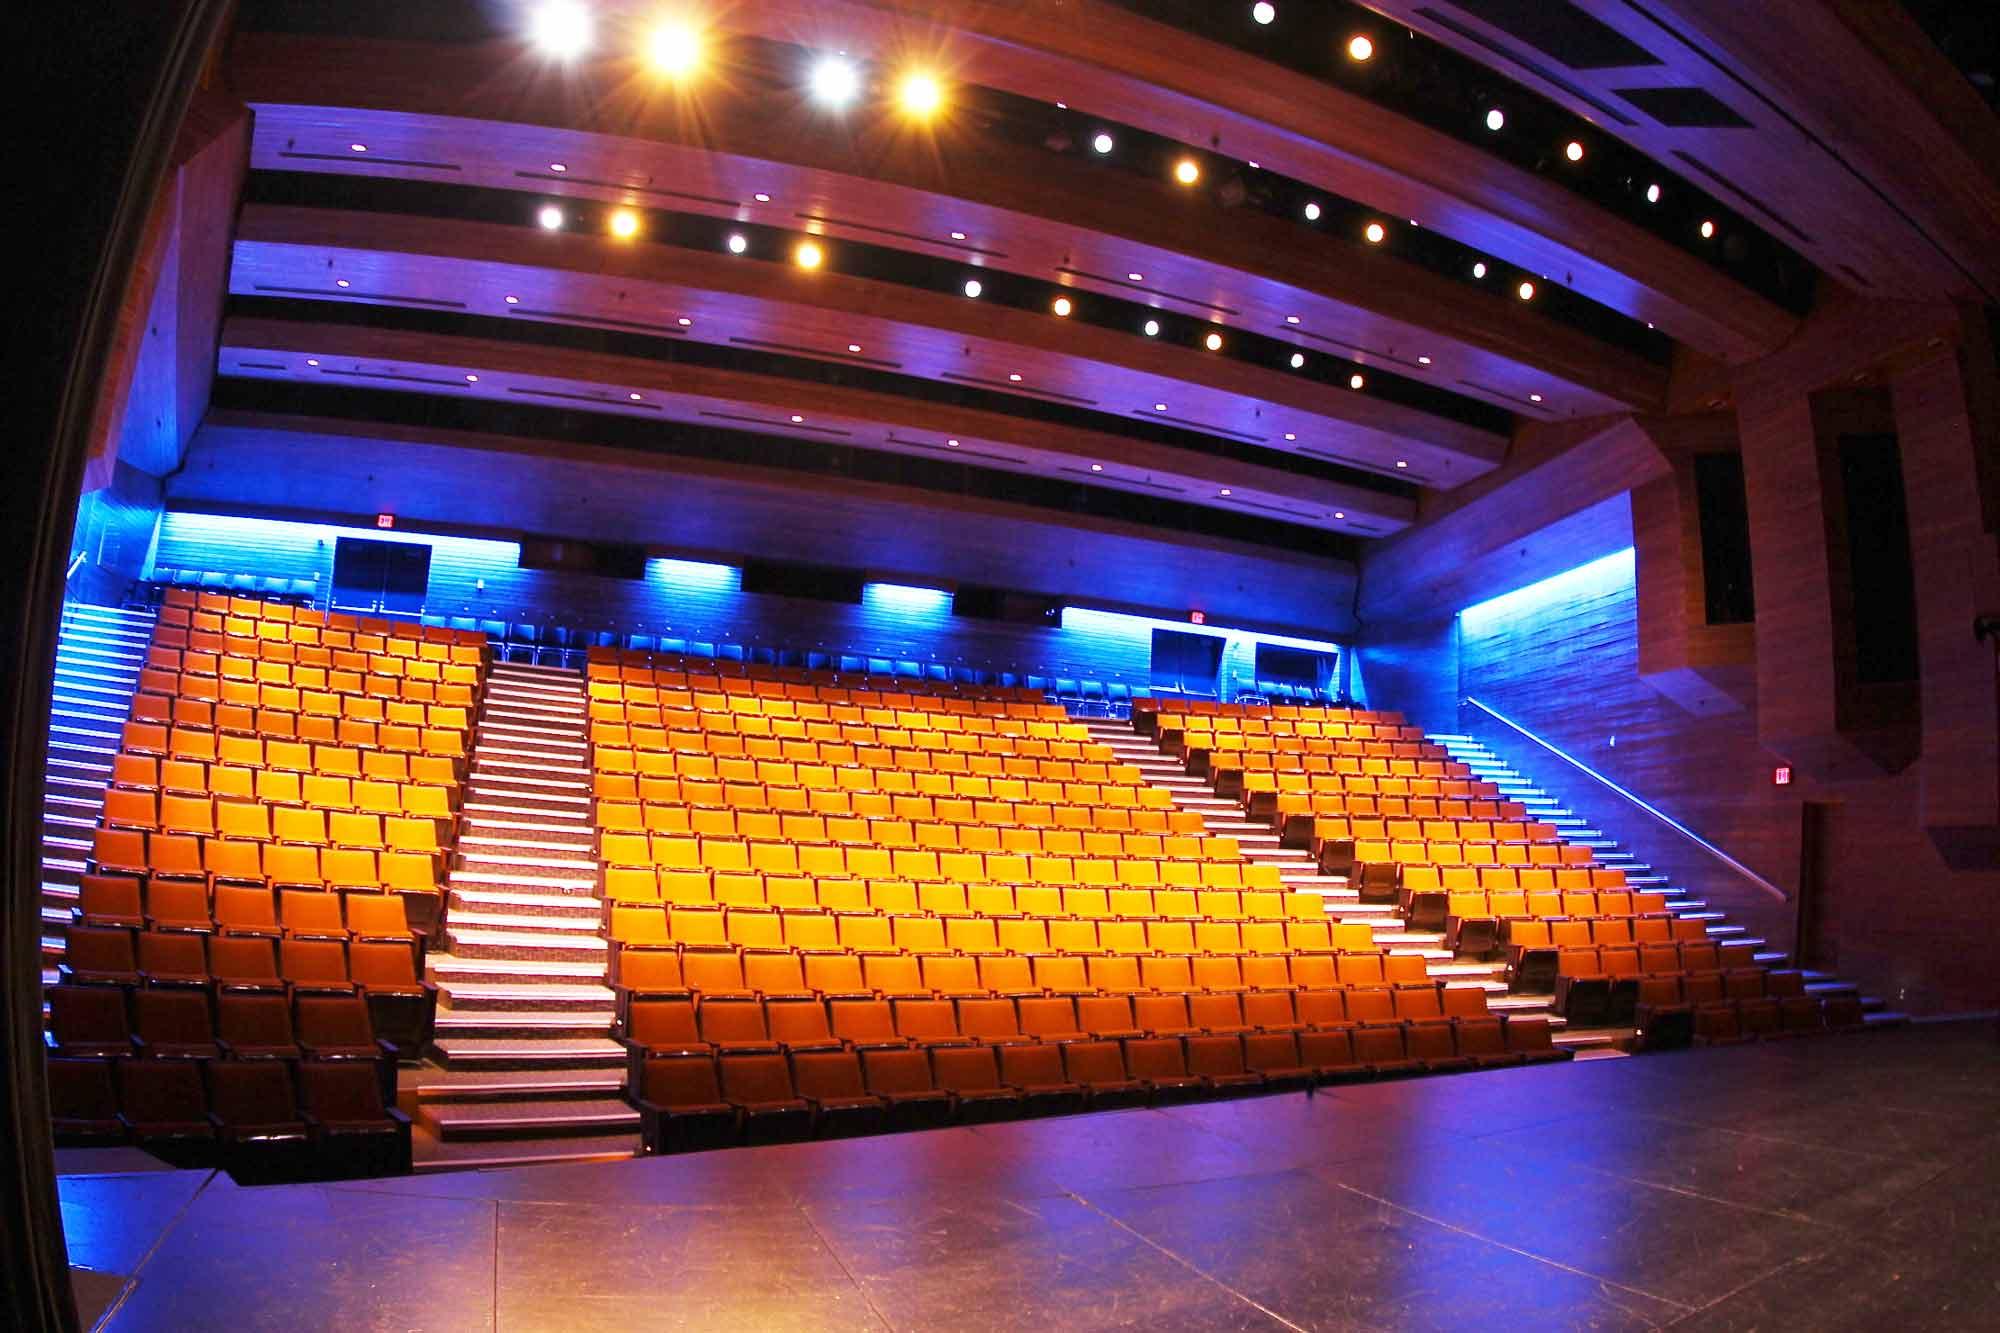 Image of seats in University Theatre